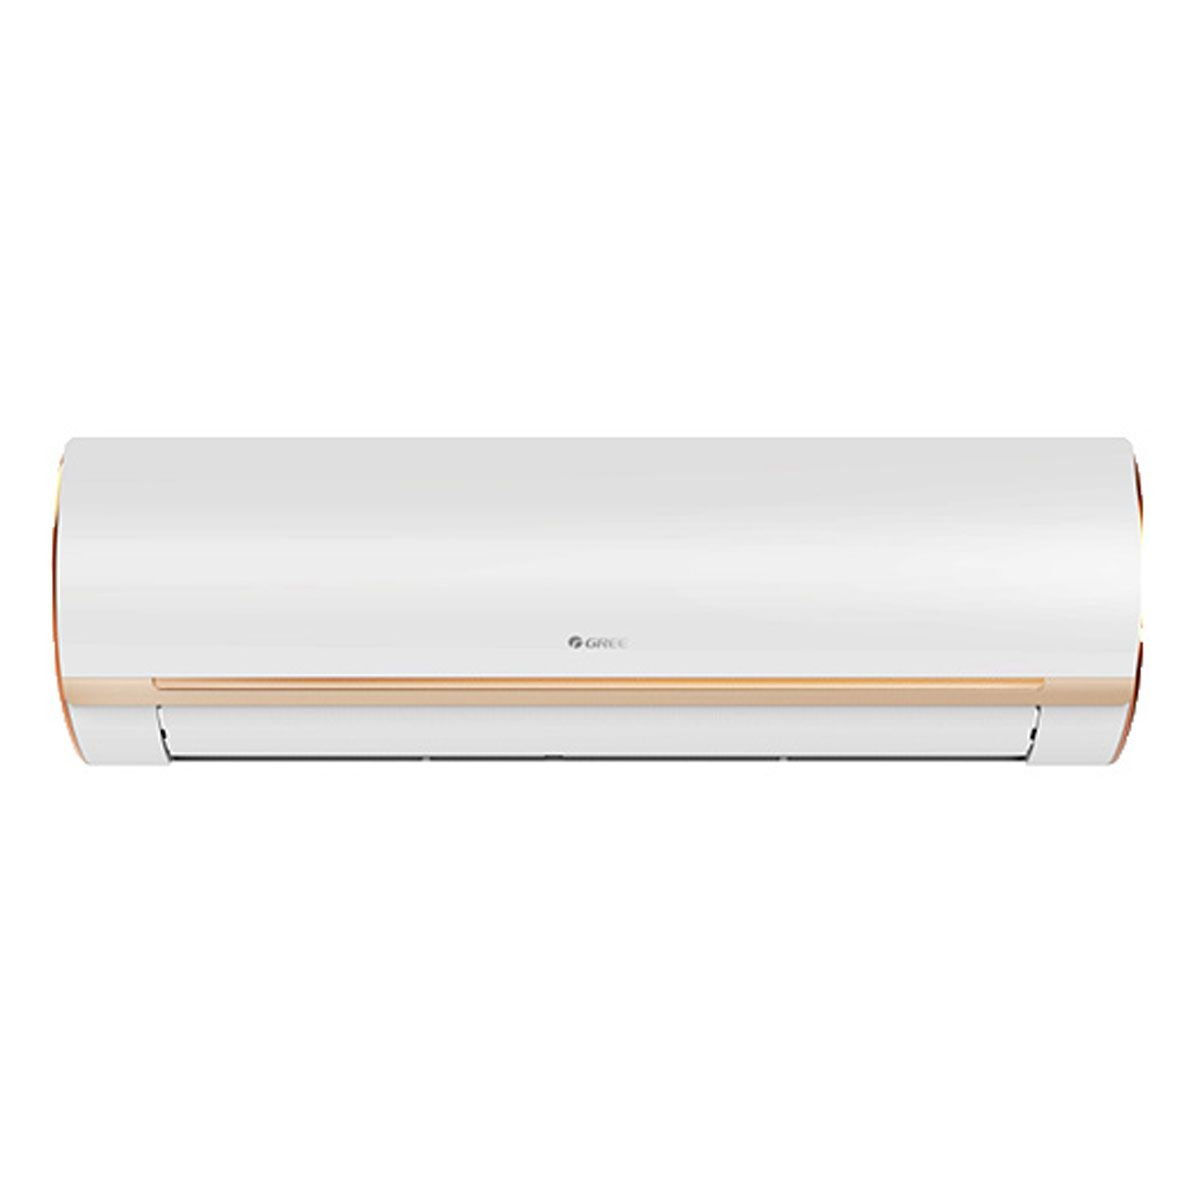 Gree 2.0 Ton Fairy Series Inverter Split AC (GS24FITH5WB)